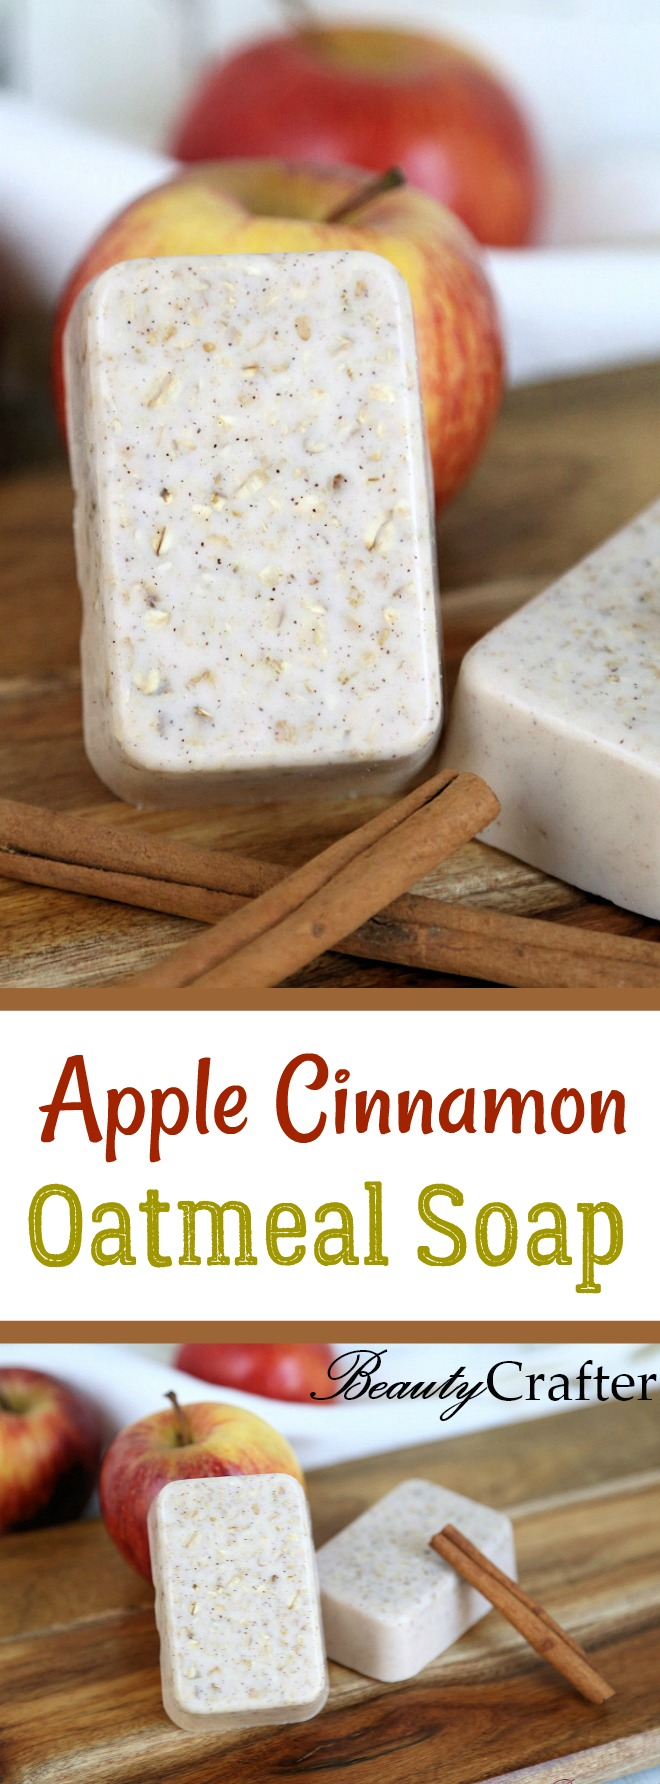 Apple Cinnamon Oatmeal Soap Easy Diy Soap Recipe For Fall